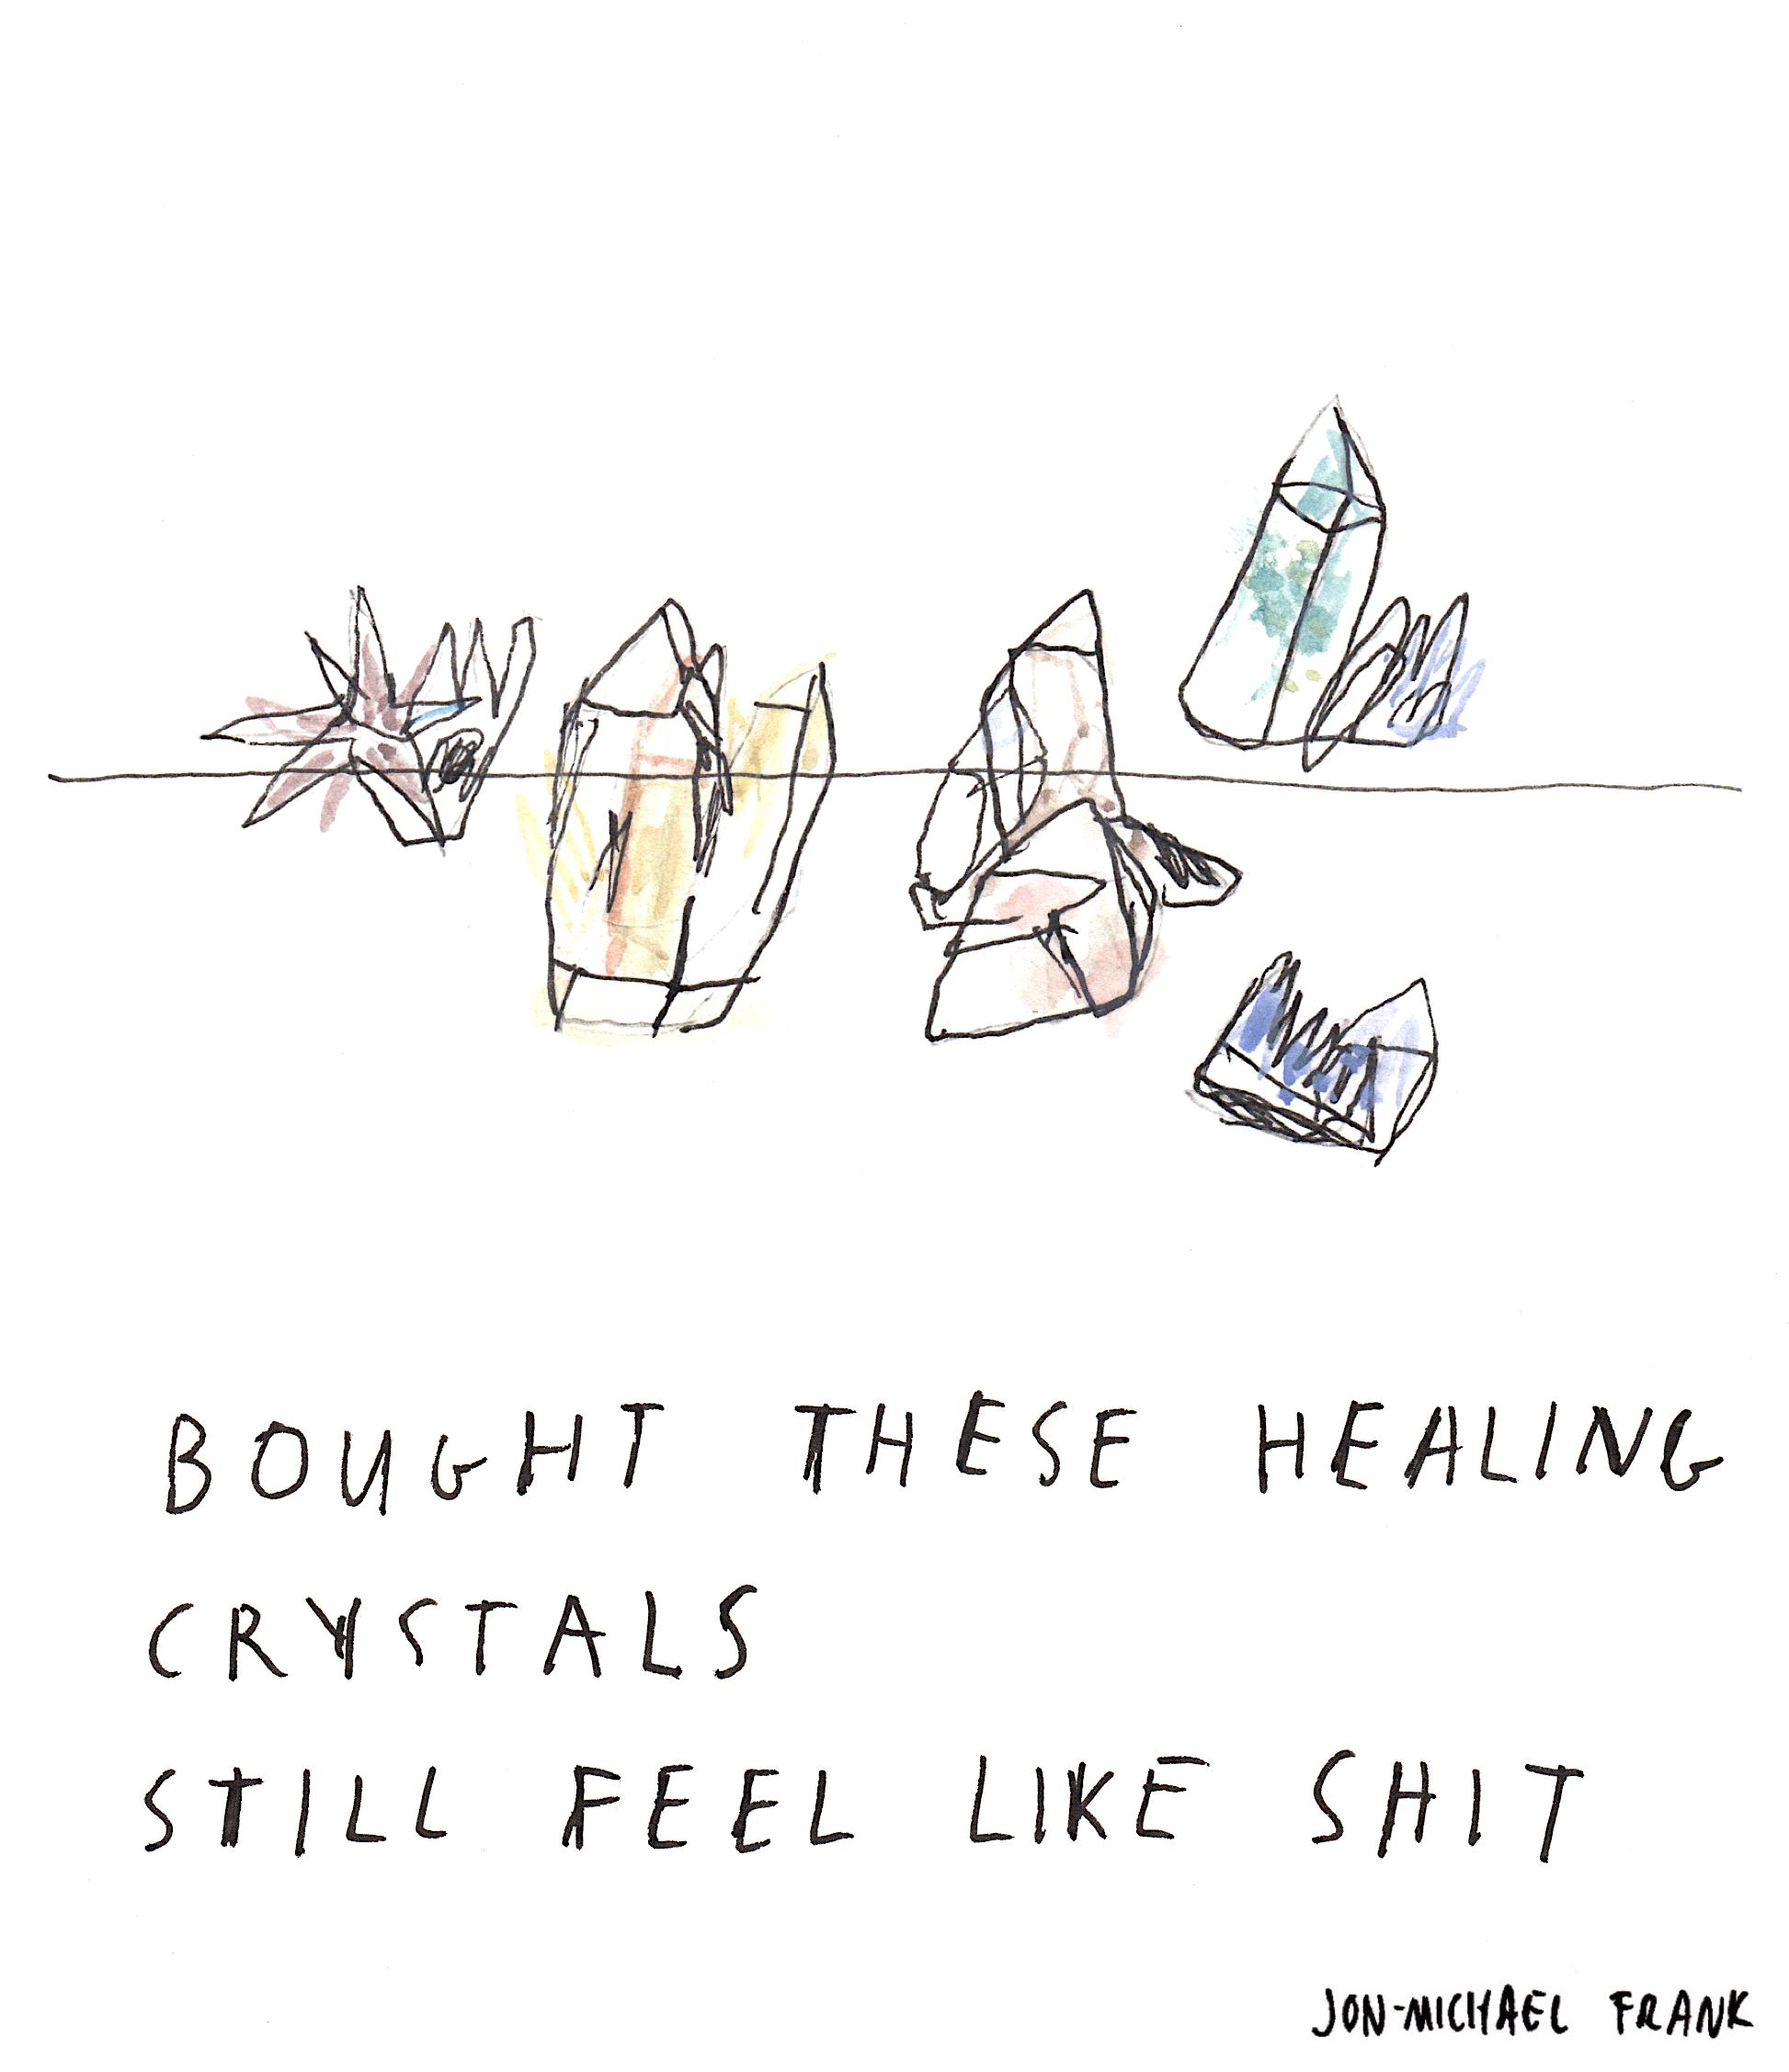 healcrystals.jpg